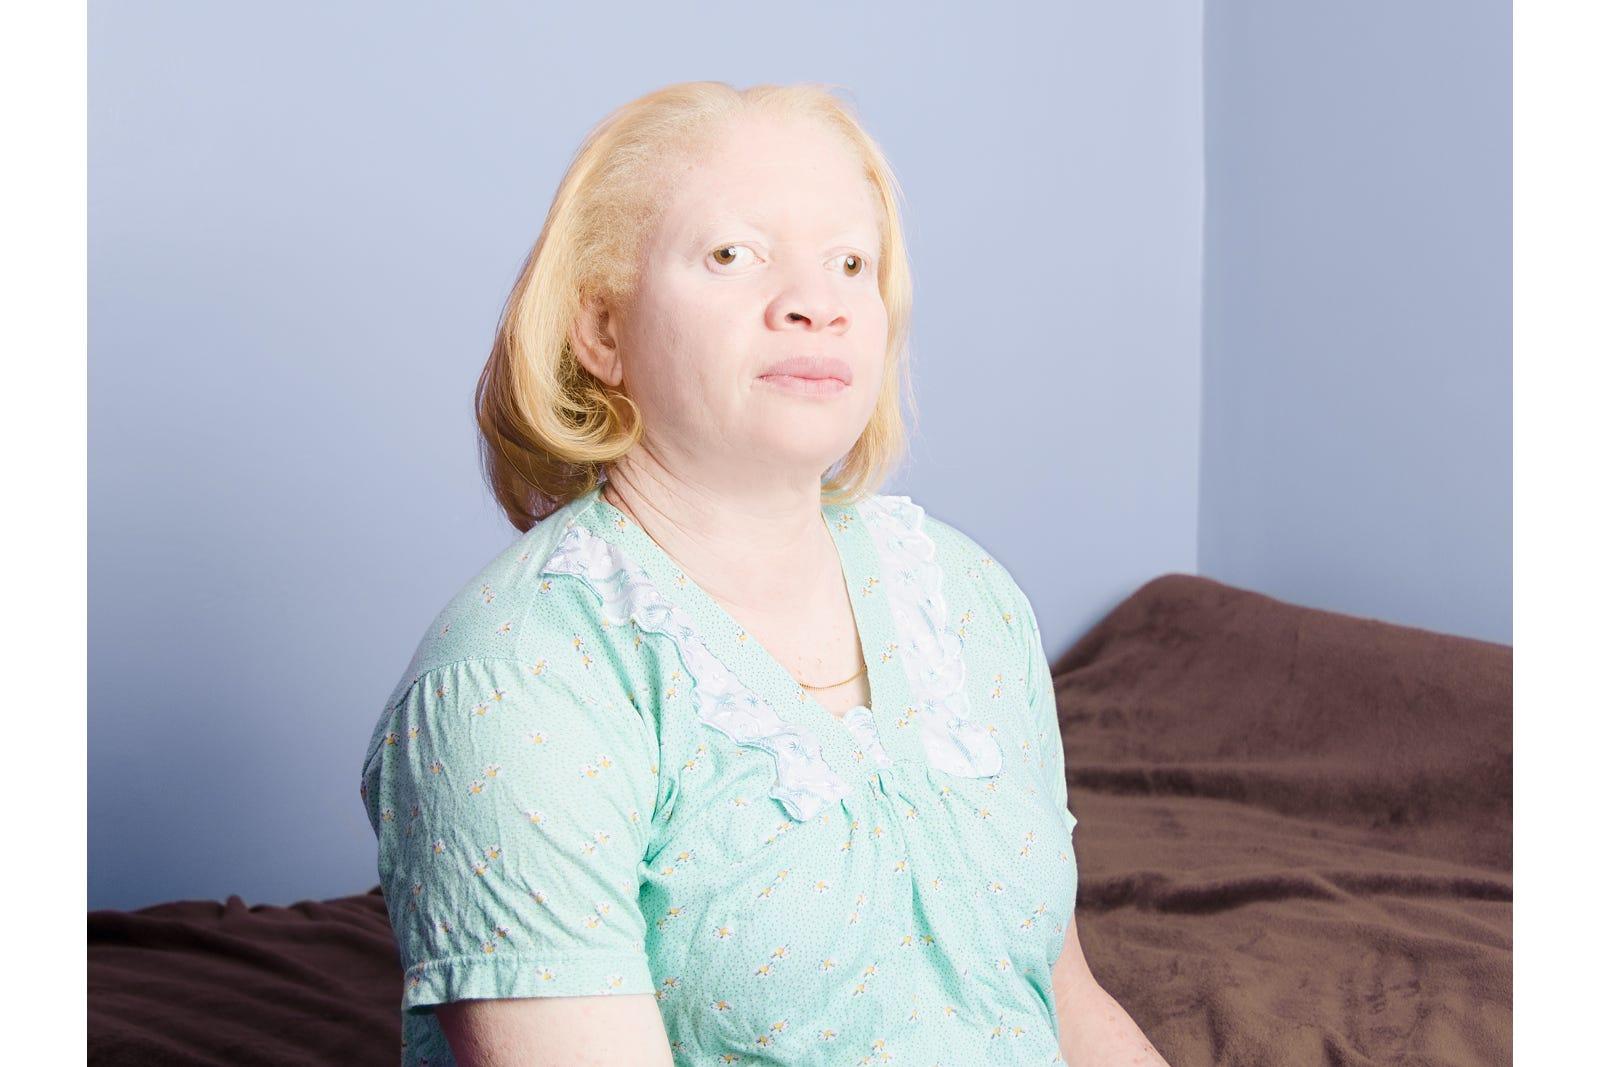 Albino People Photos Albinism Portraits